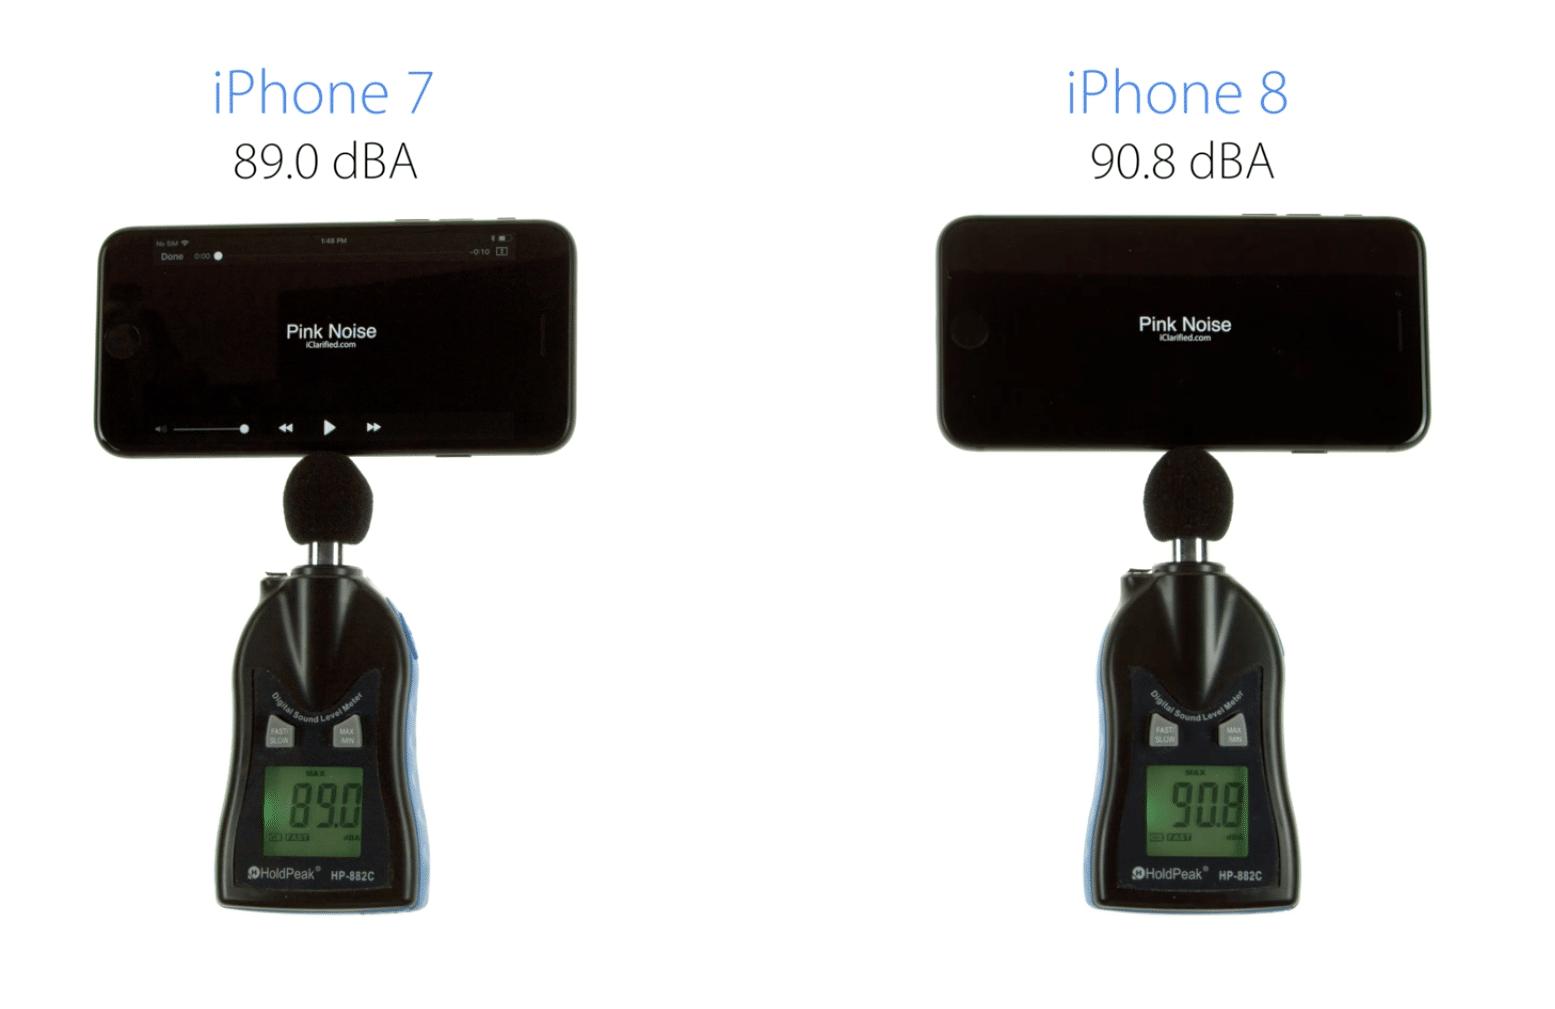 speaker-volume-test-iphone-8-vs-iphone-7-video 1